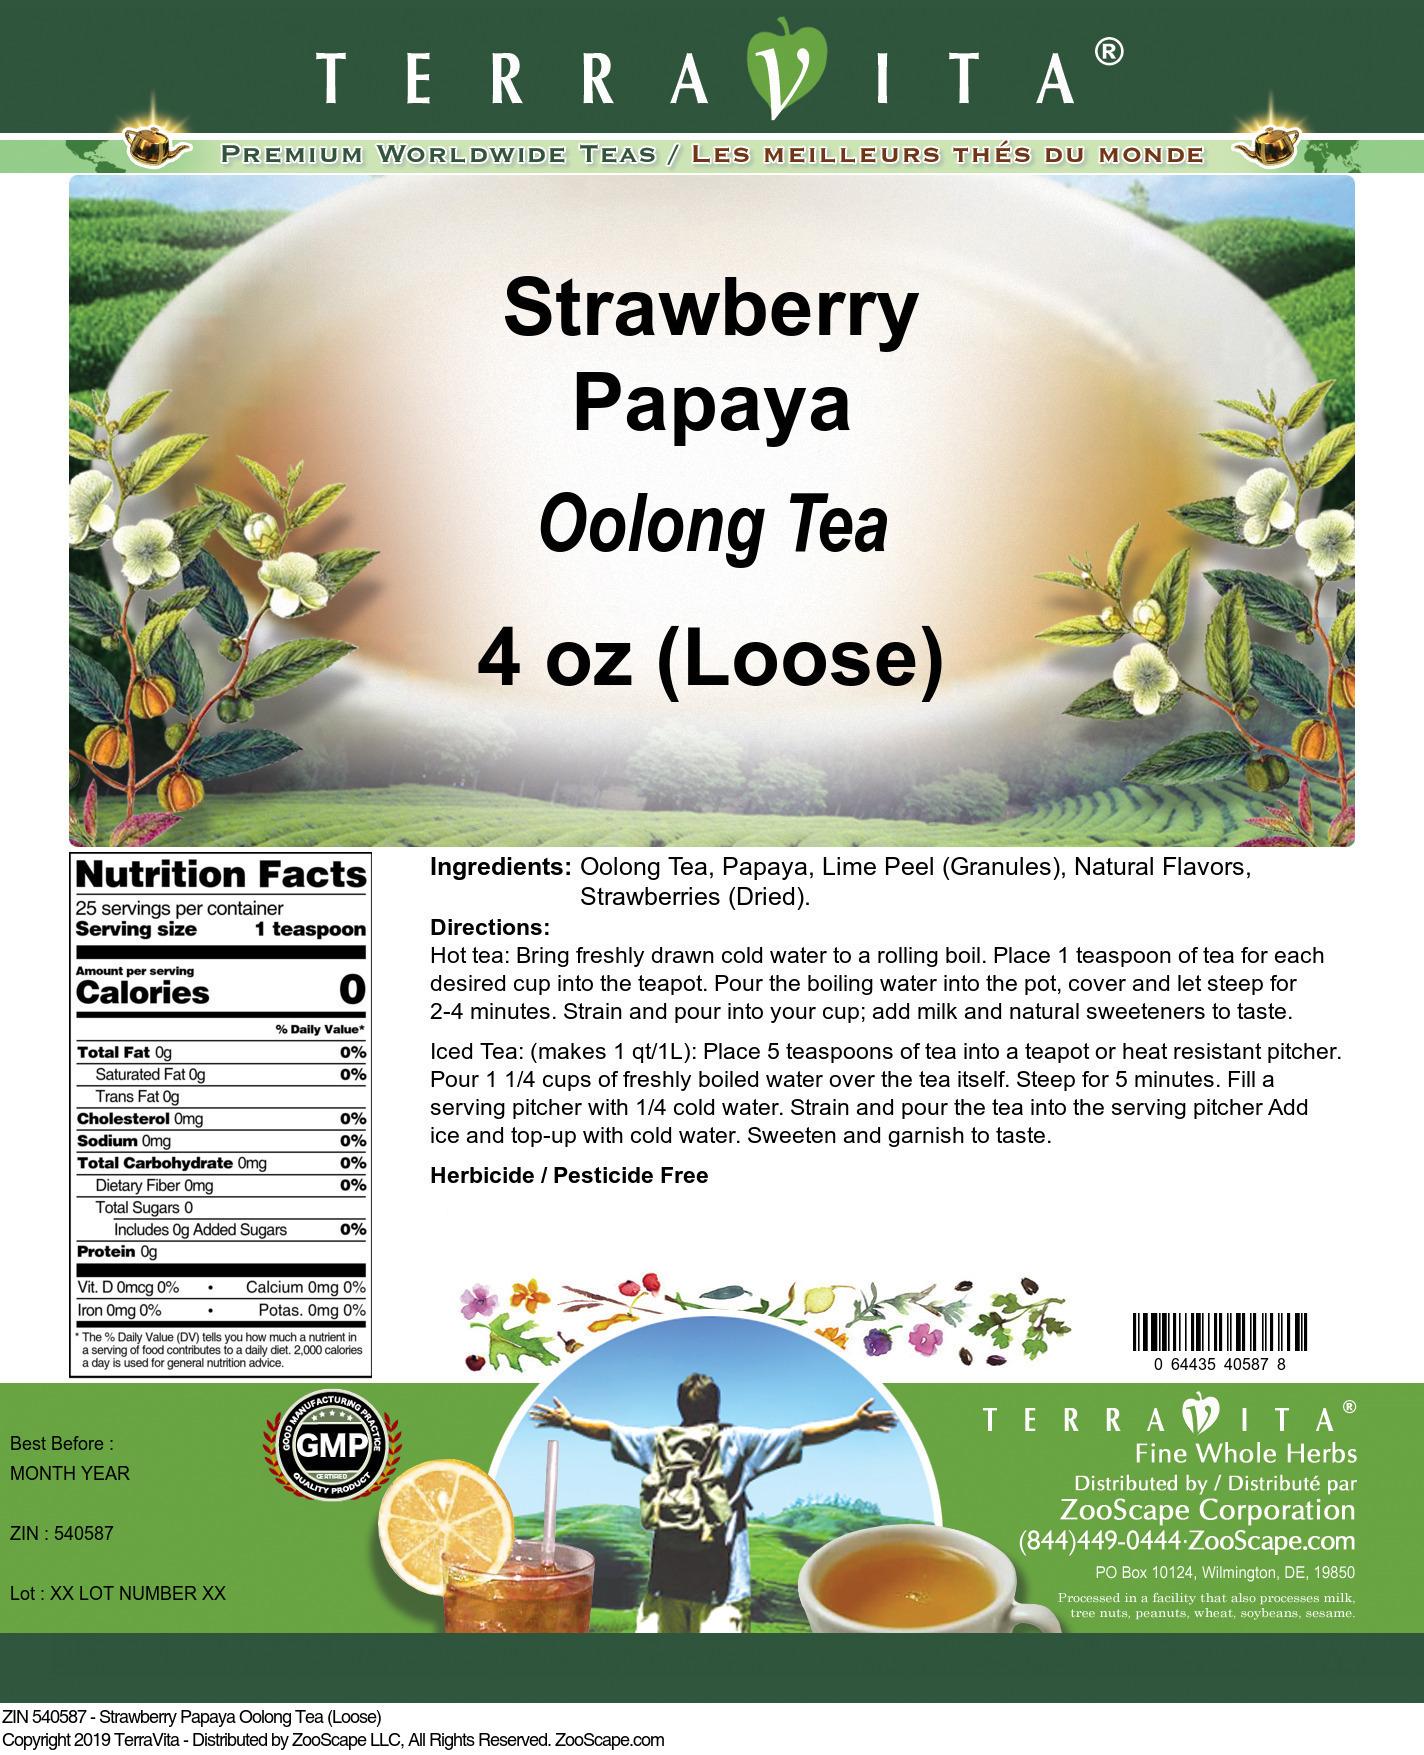 Strawberry Papaya Oolong Tea (Loose)